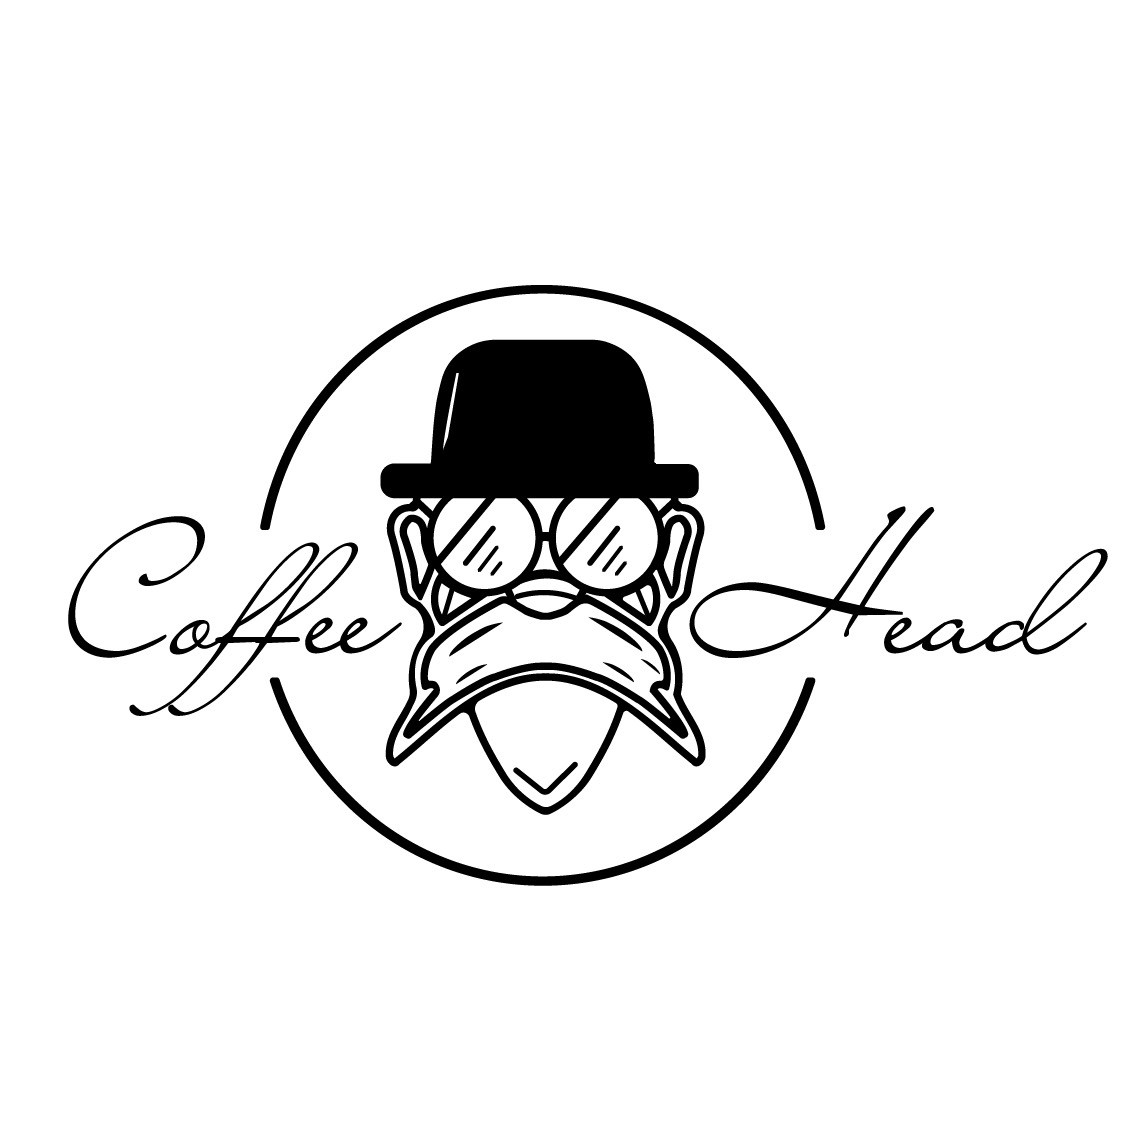 Coffee head logo